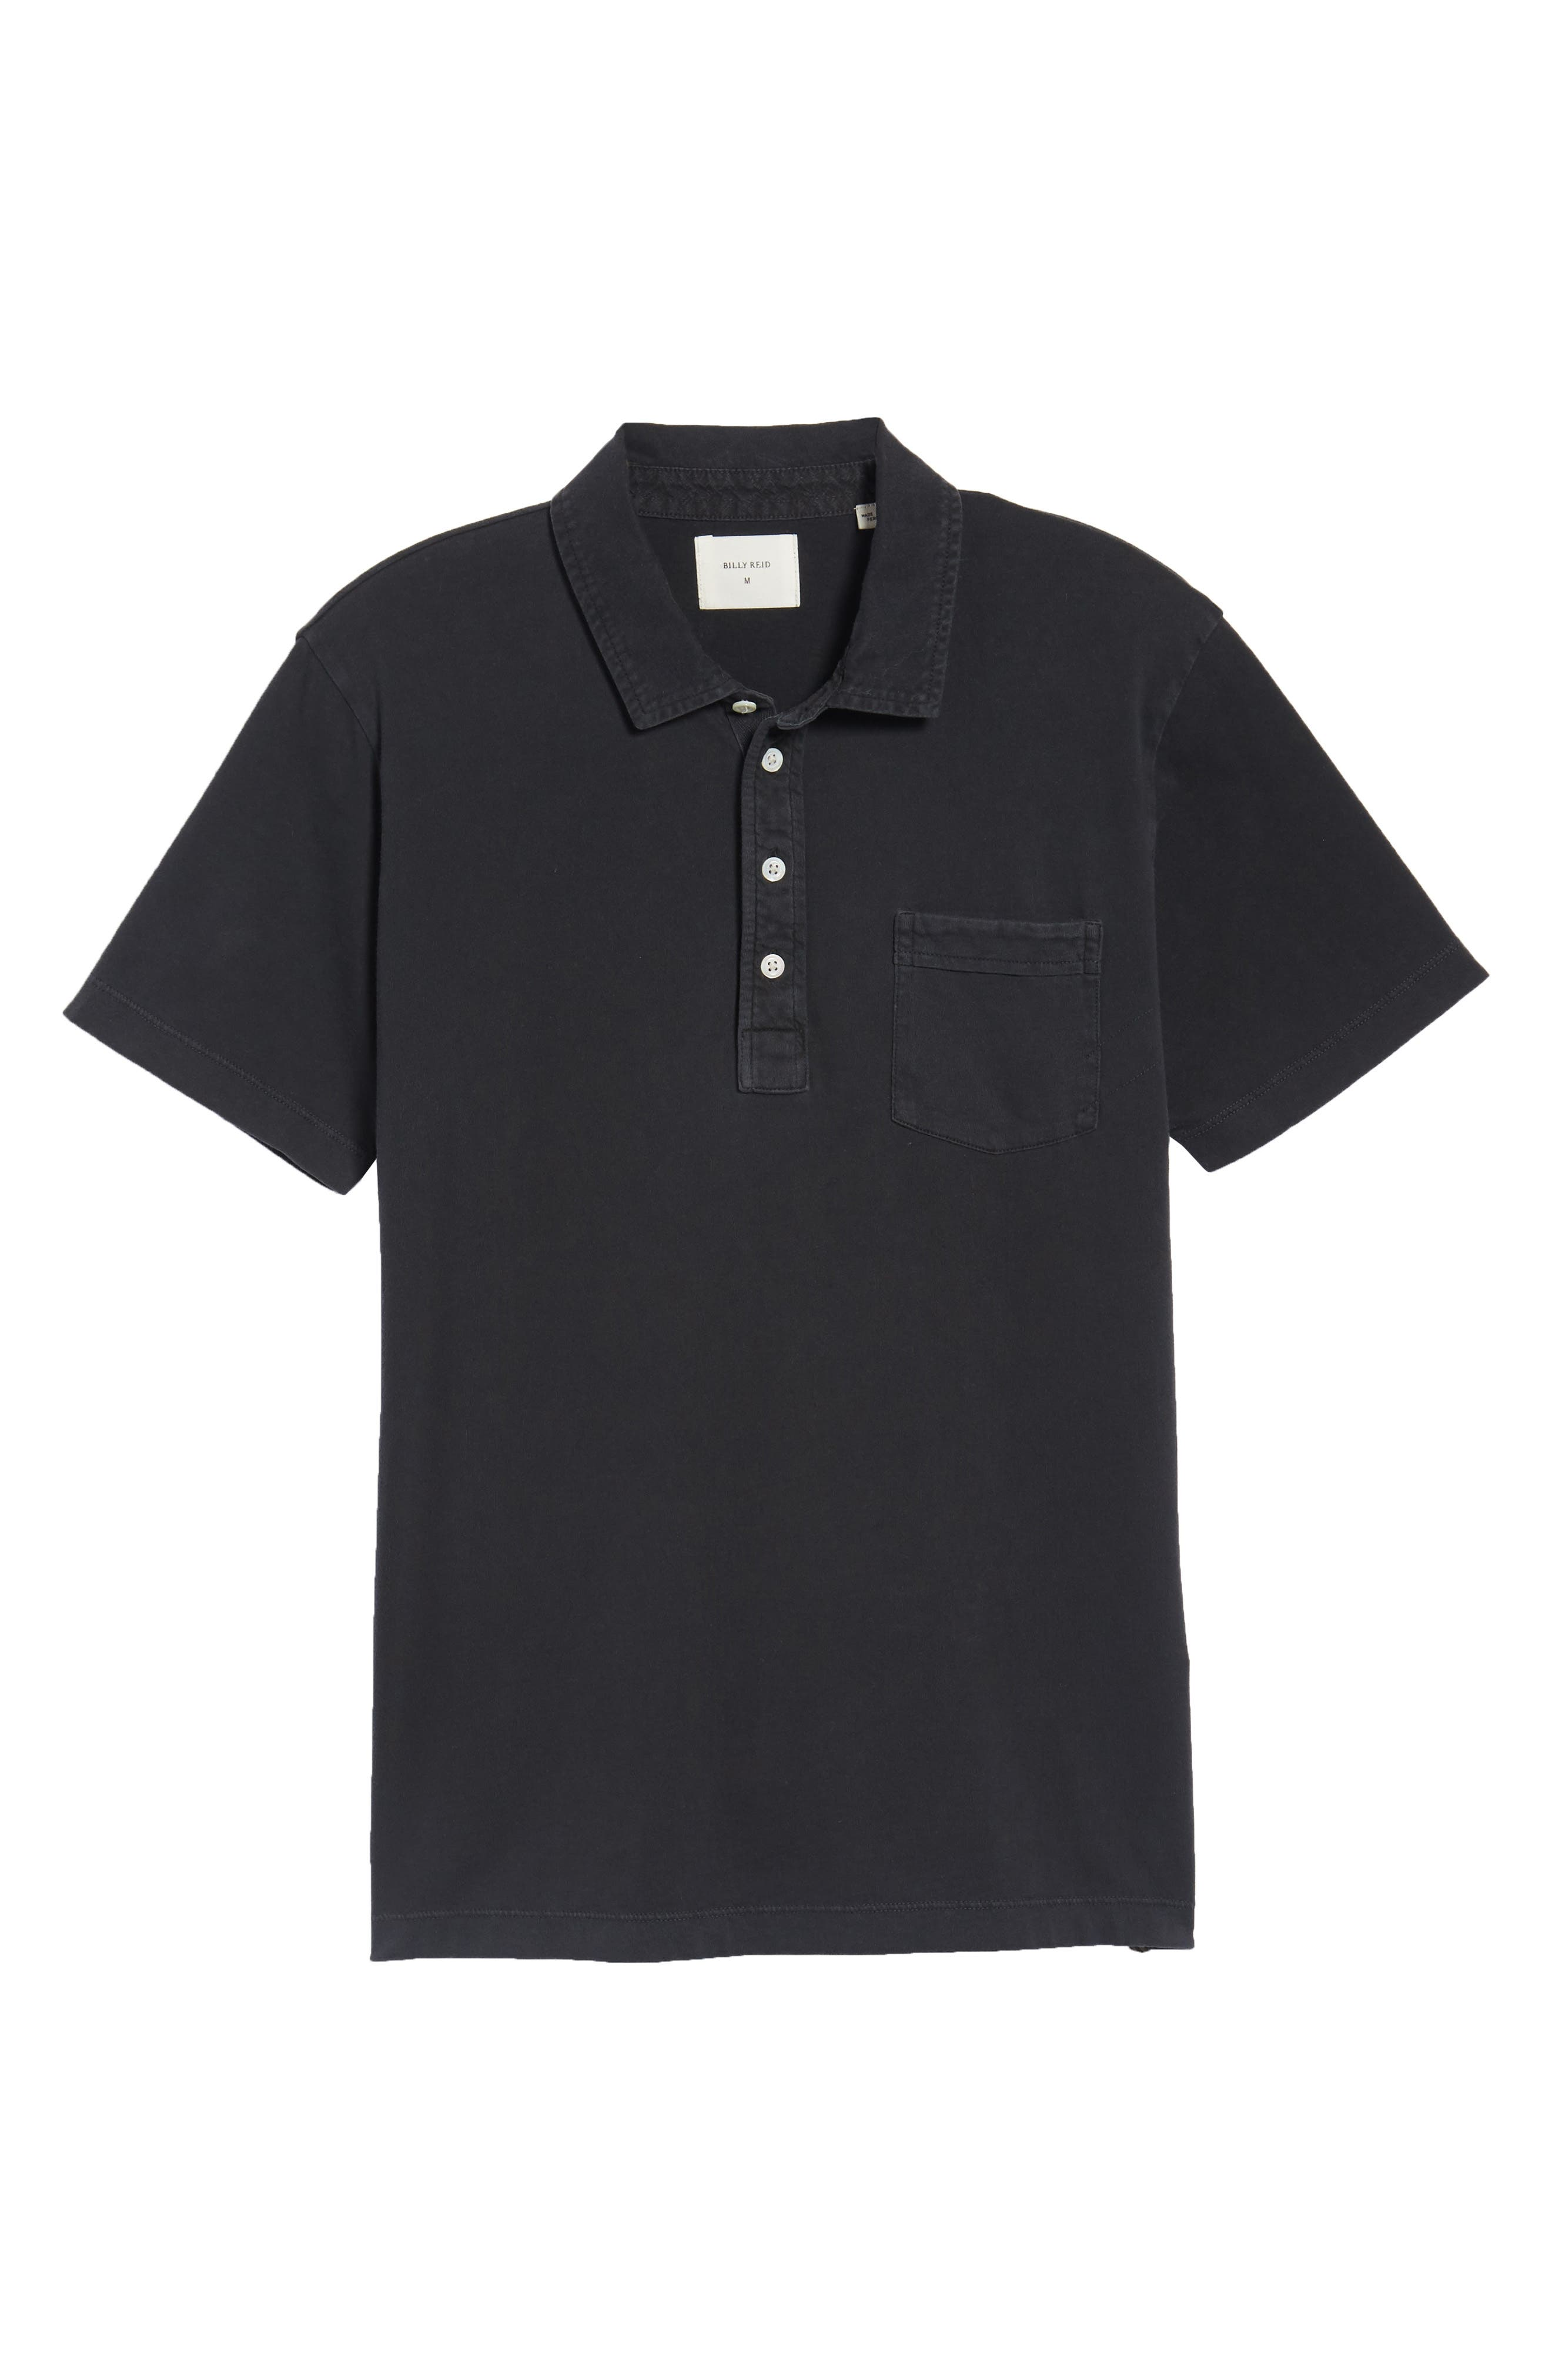 BILLY REID, Pensacola Slim Fit Garment Dye Polo, Alternate thumbnail 6, color, BLACK